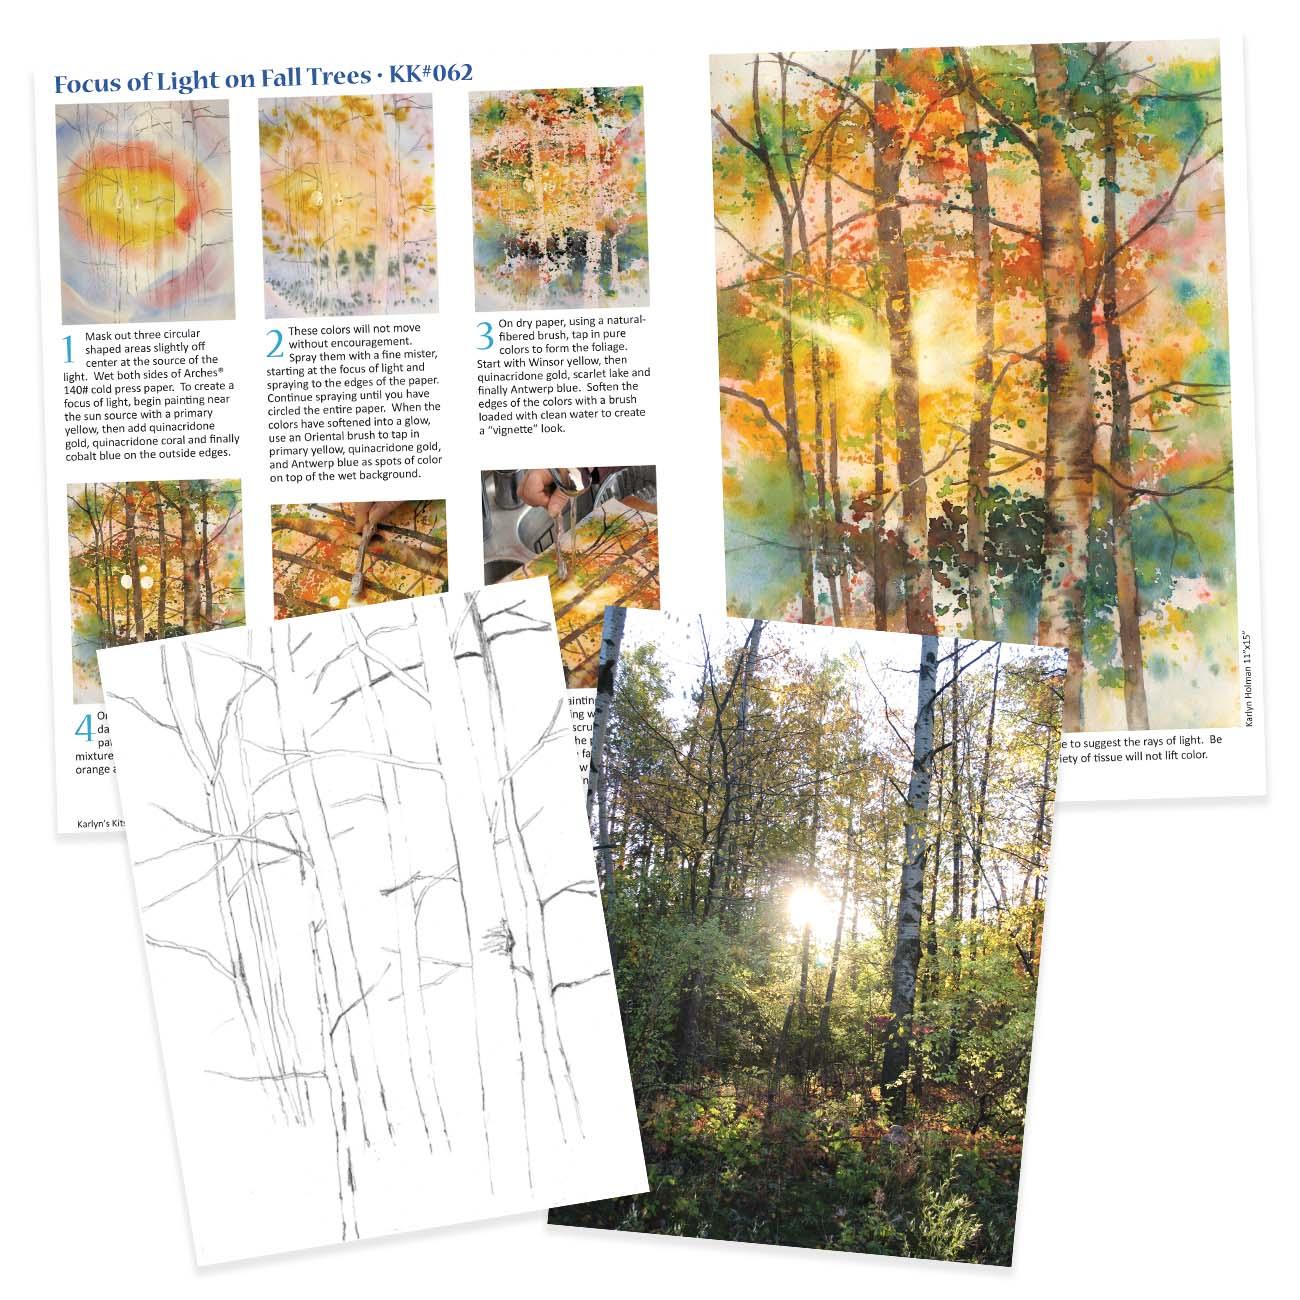 KK062 - Focus of Light on Fall Trees